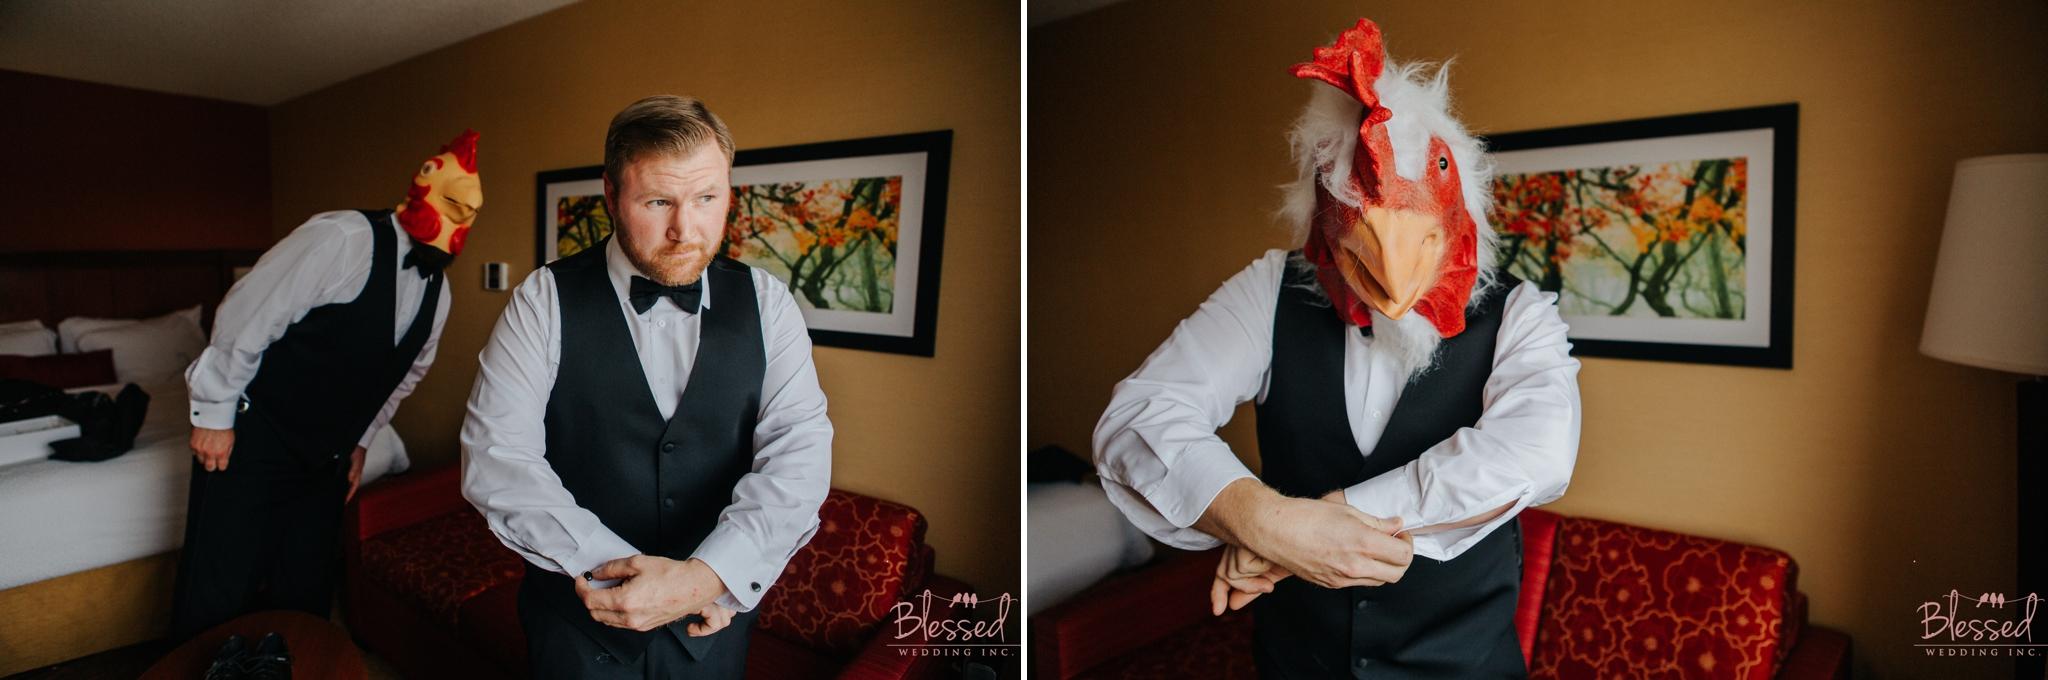 Orfila Vinery Wedding by Blessed Wedding Photography 9.jpg